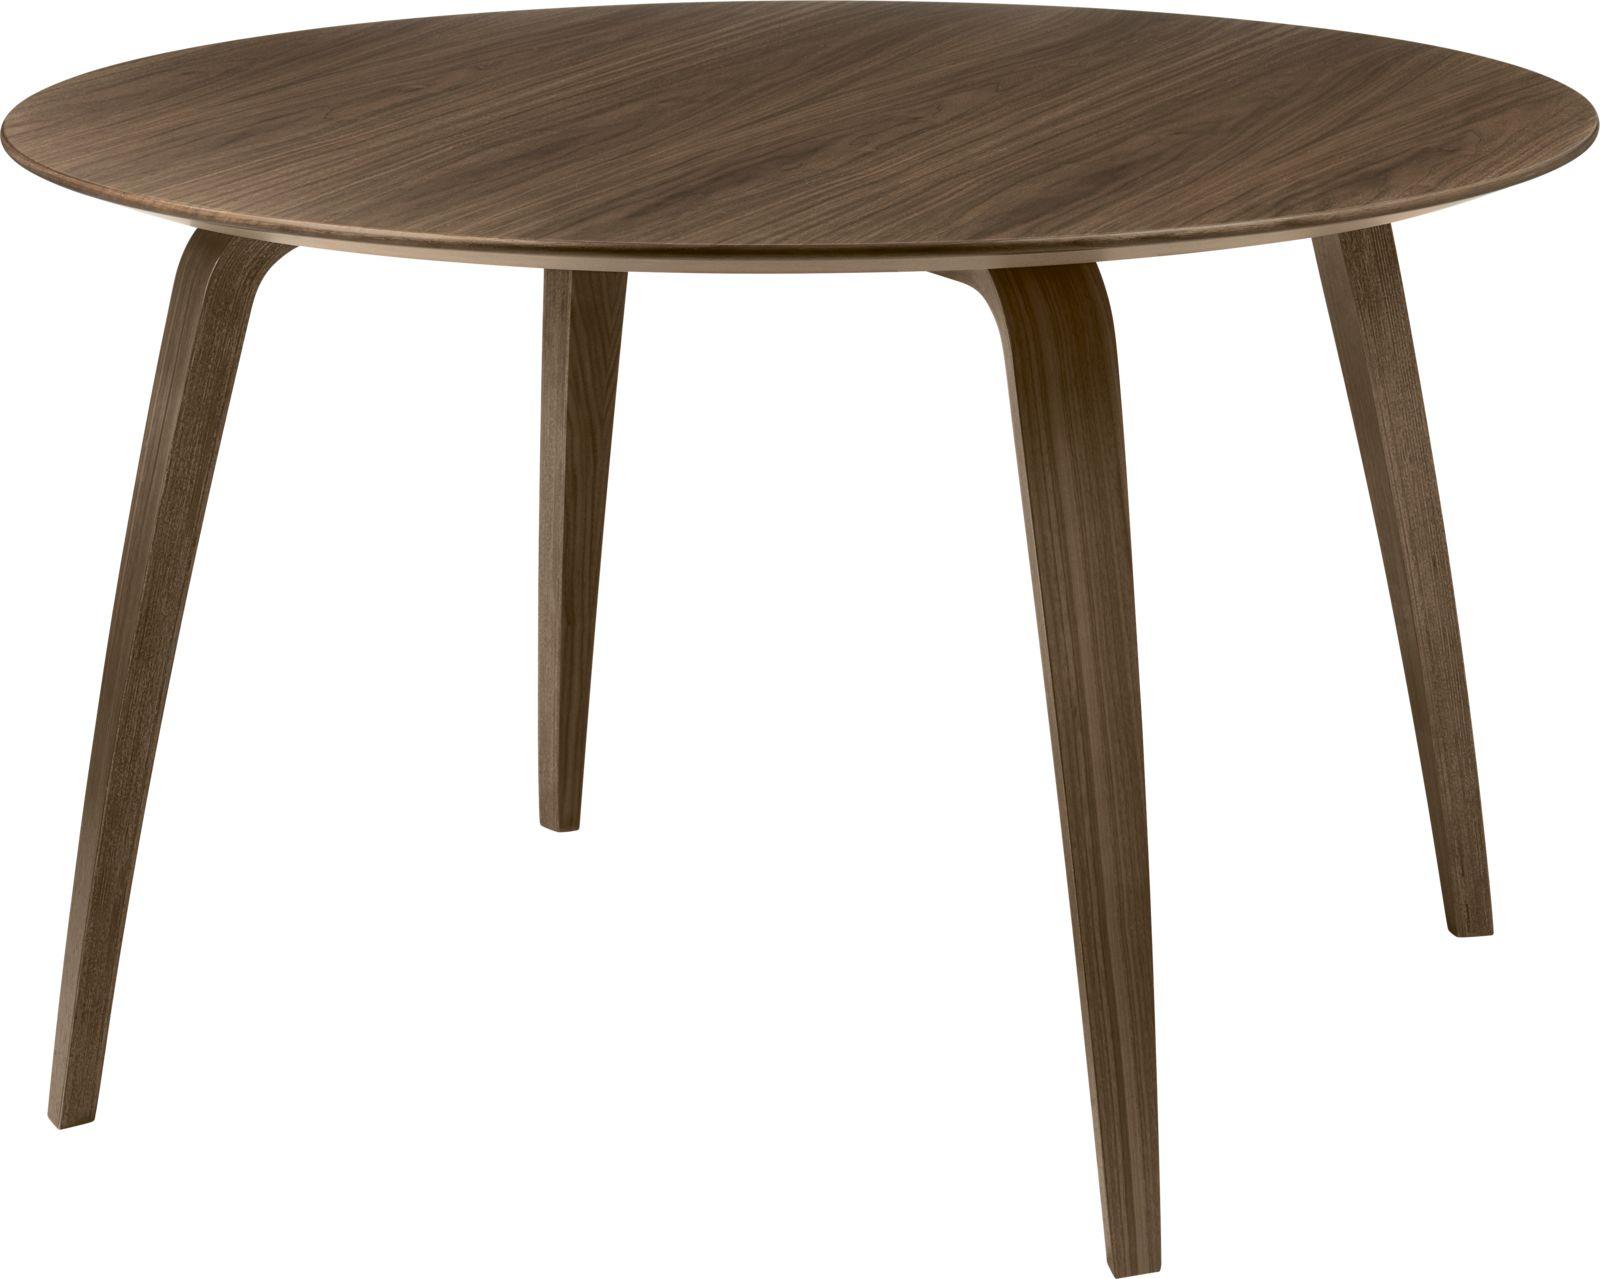 Gubi Gubi Dining Tables Round Rectangular Amp Elliptical